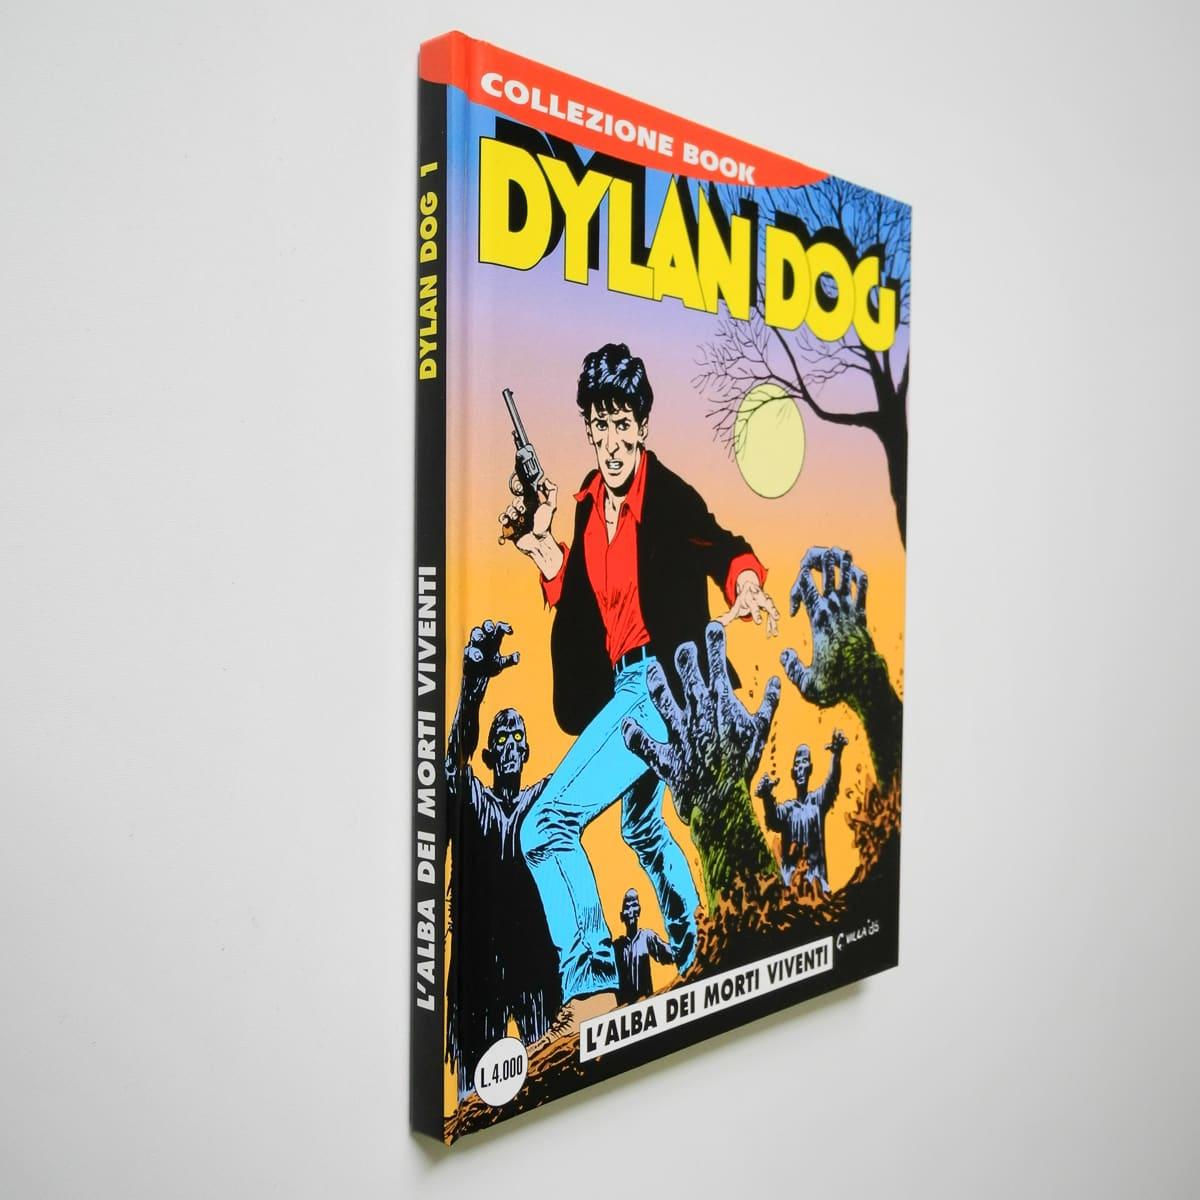 Dylan Dog Collezione Book n. 1 Bonelli